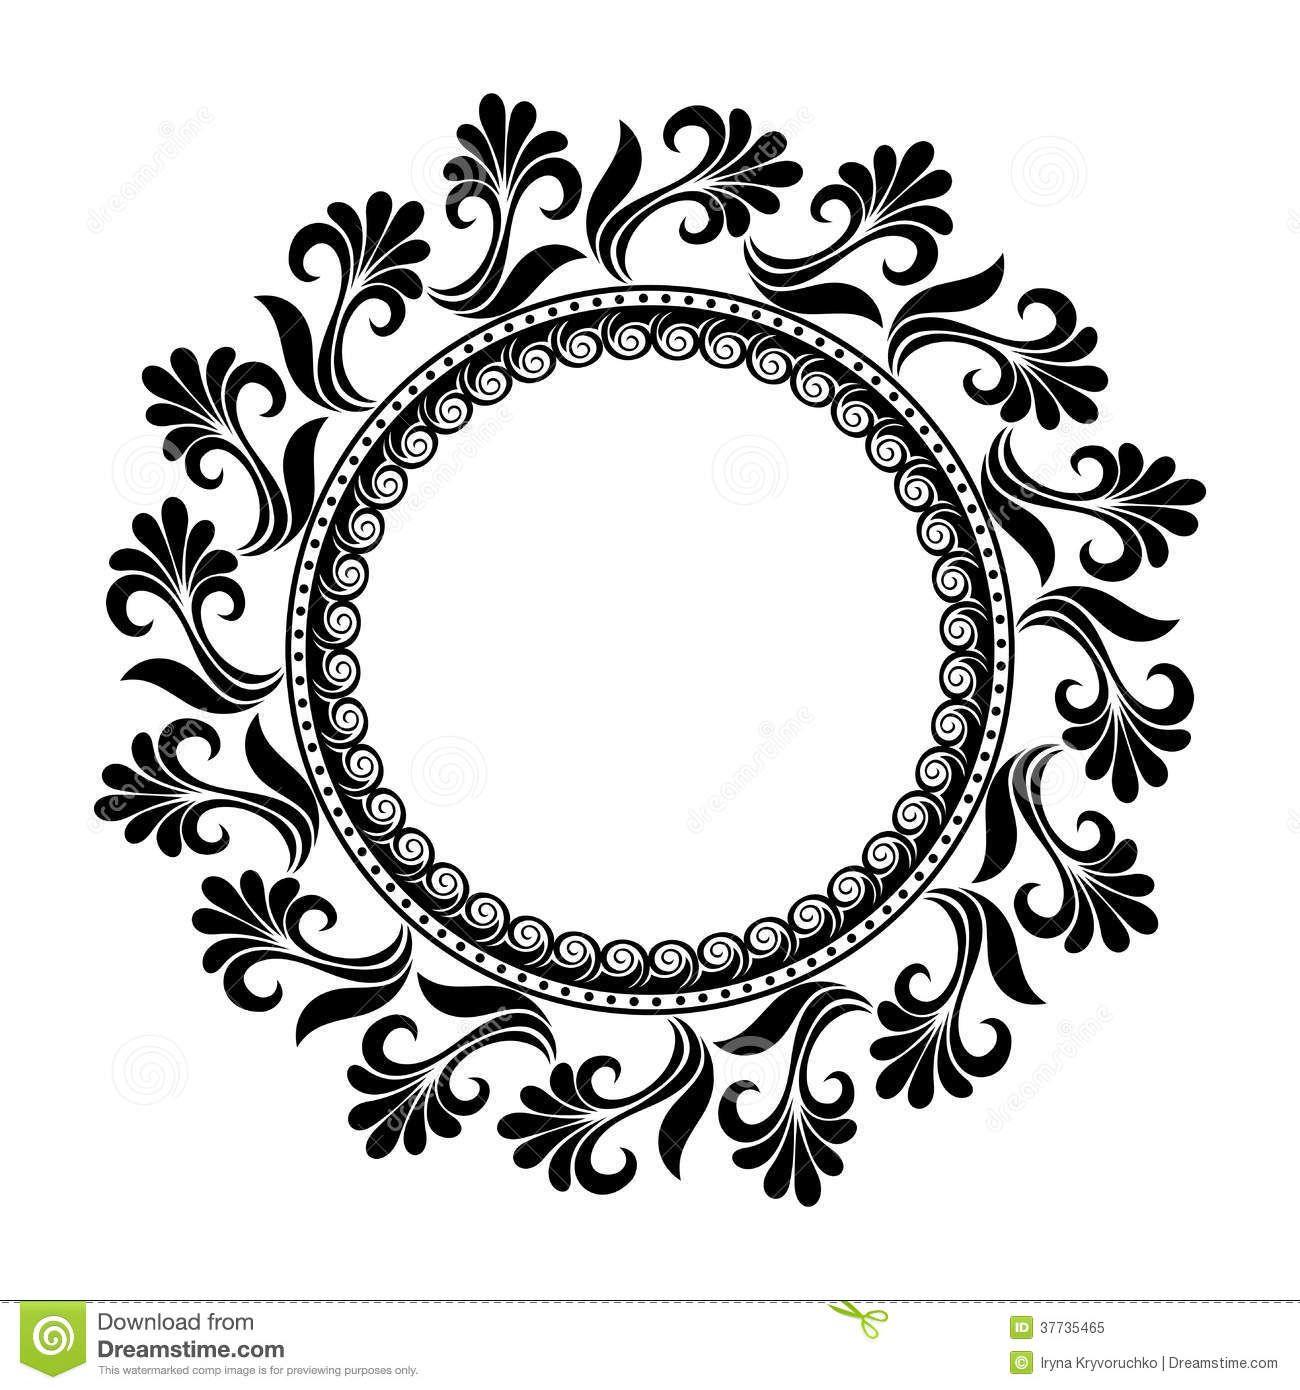 Black Flower Decorative Frame Vectors Material 04 Free: Vector Floral Circle - Поиск в Google